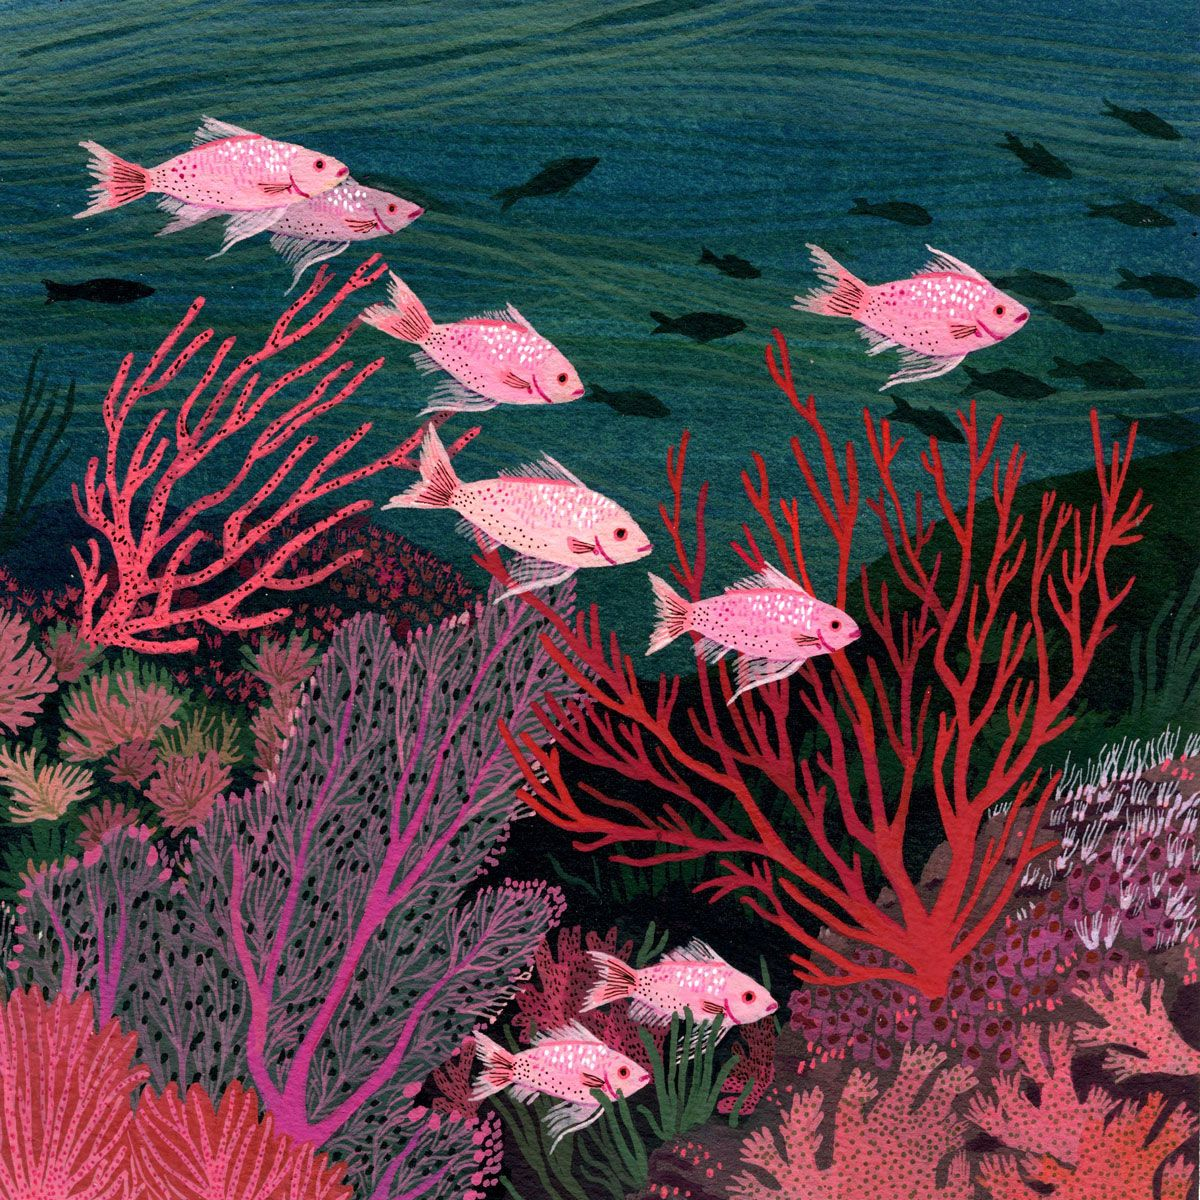 Underwater Sea Illustration